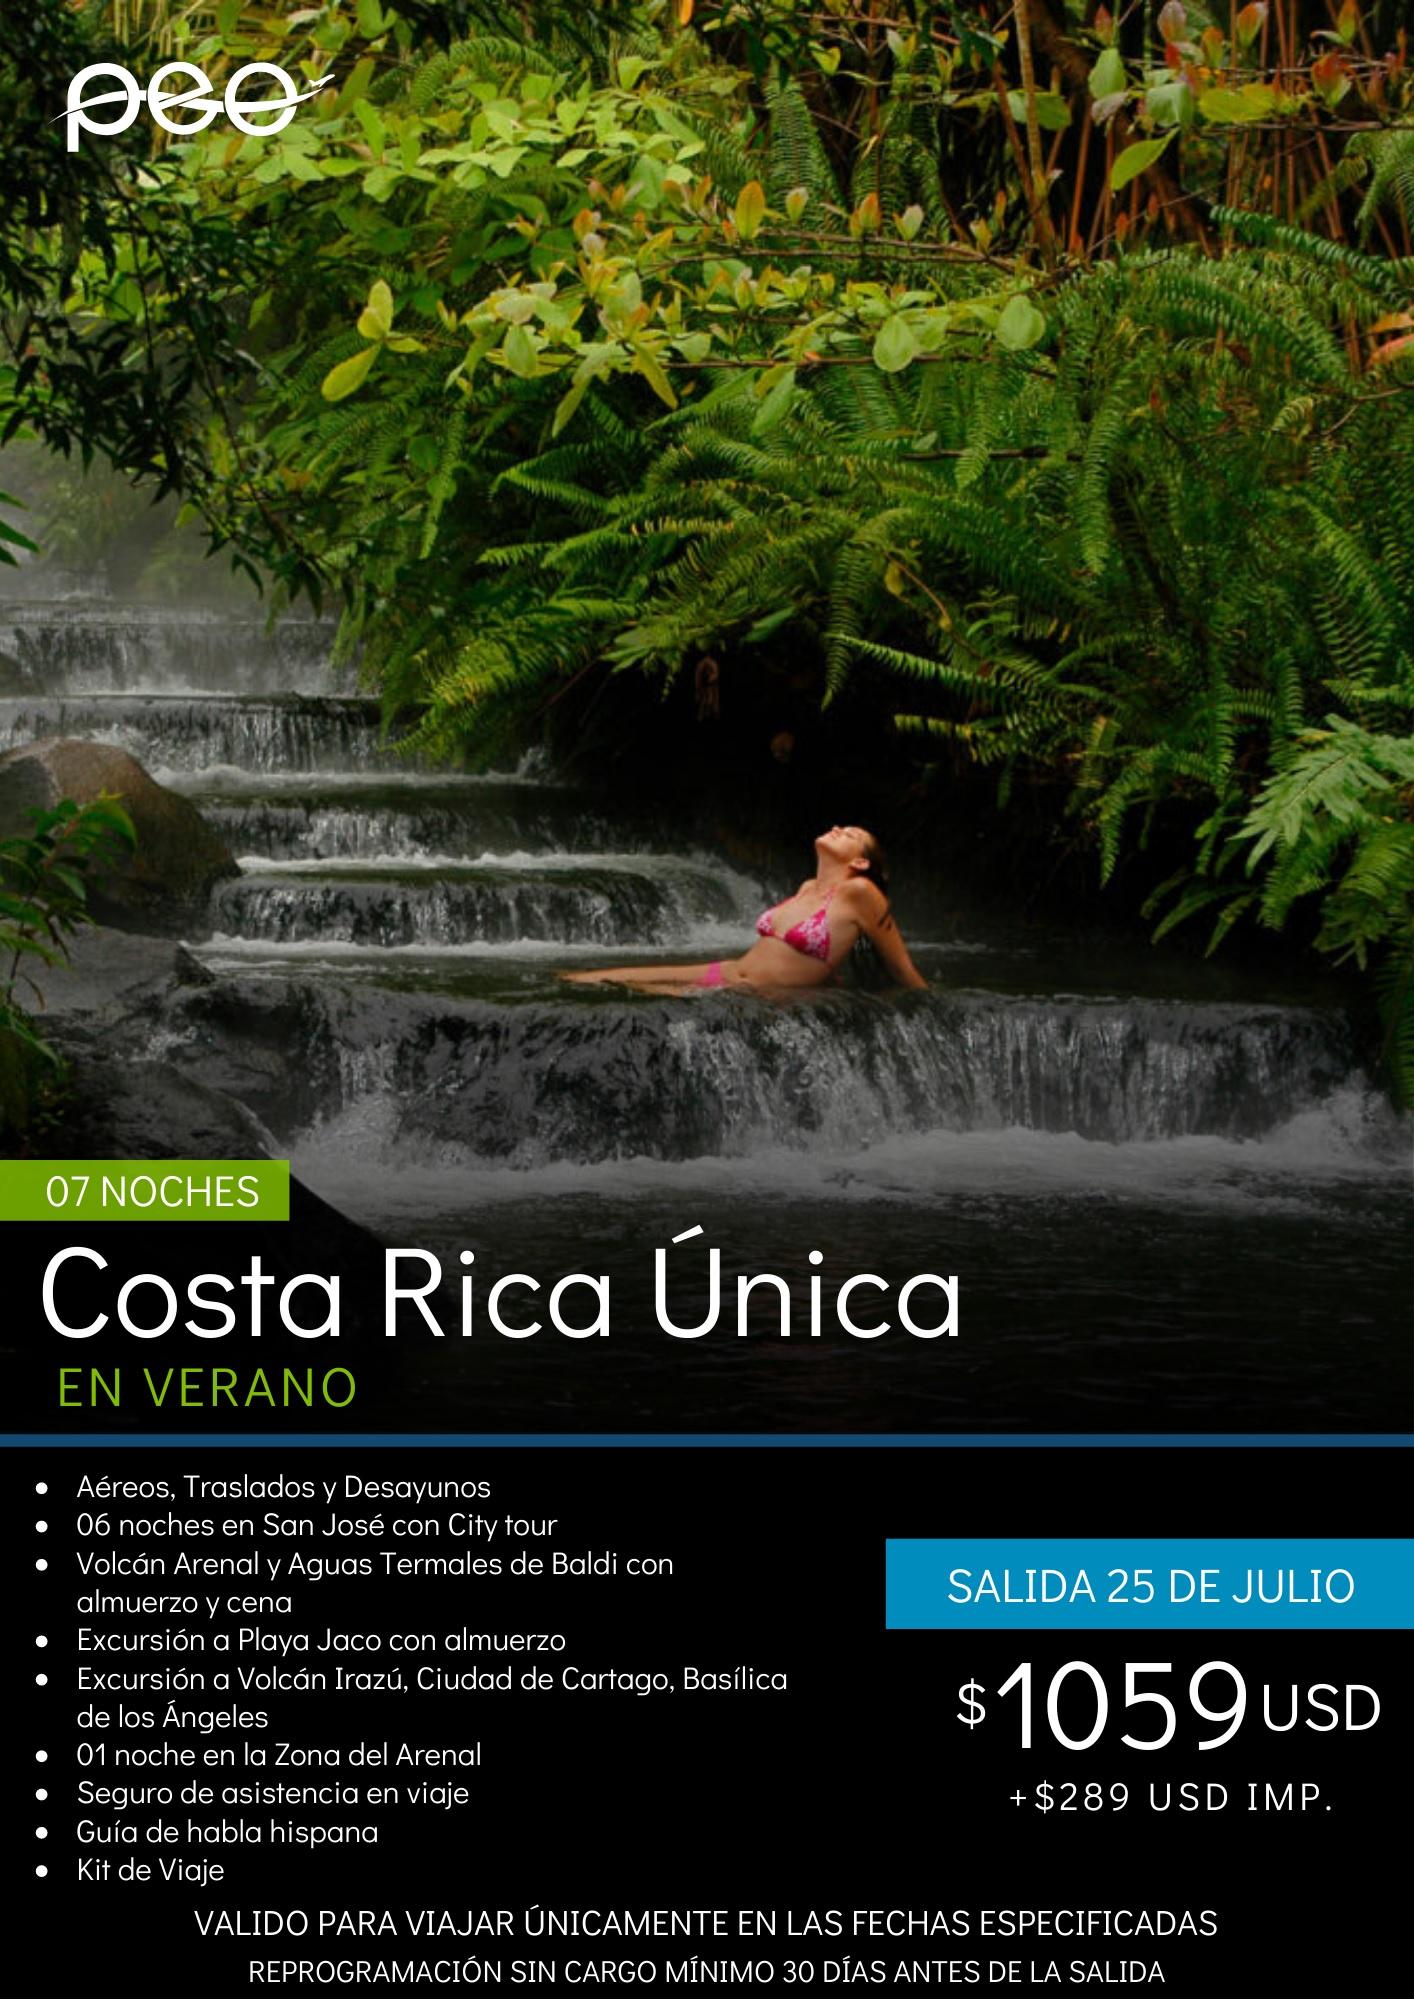 https://0201.nccdn.net/1_2/000/000/0c9/a6b/Costa-Rica-Verano.jpg